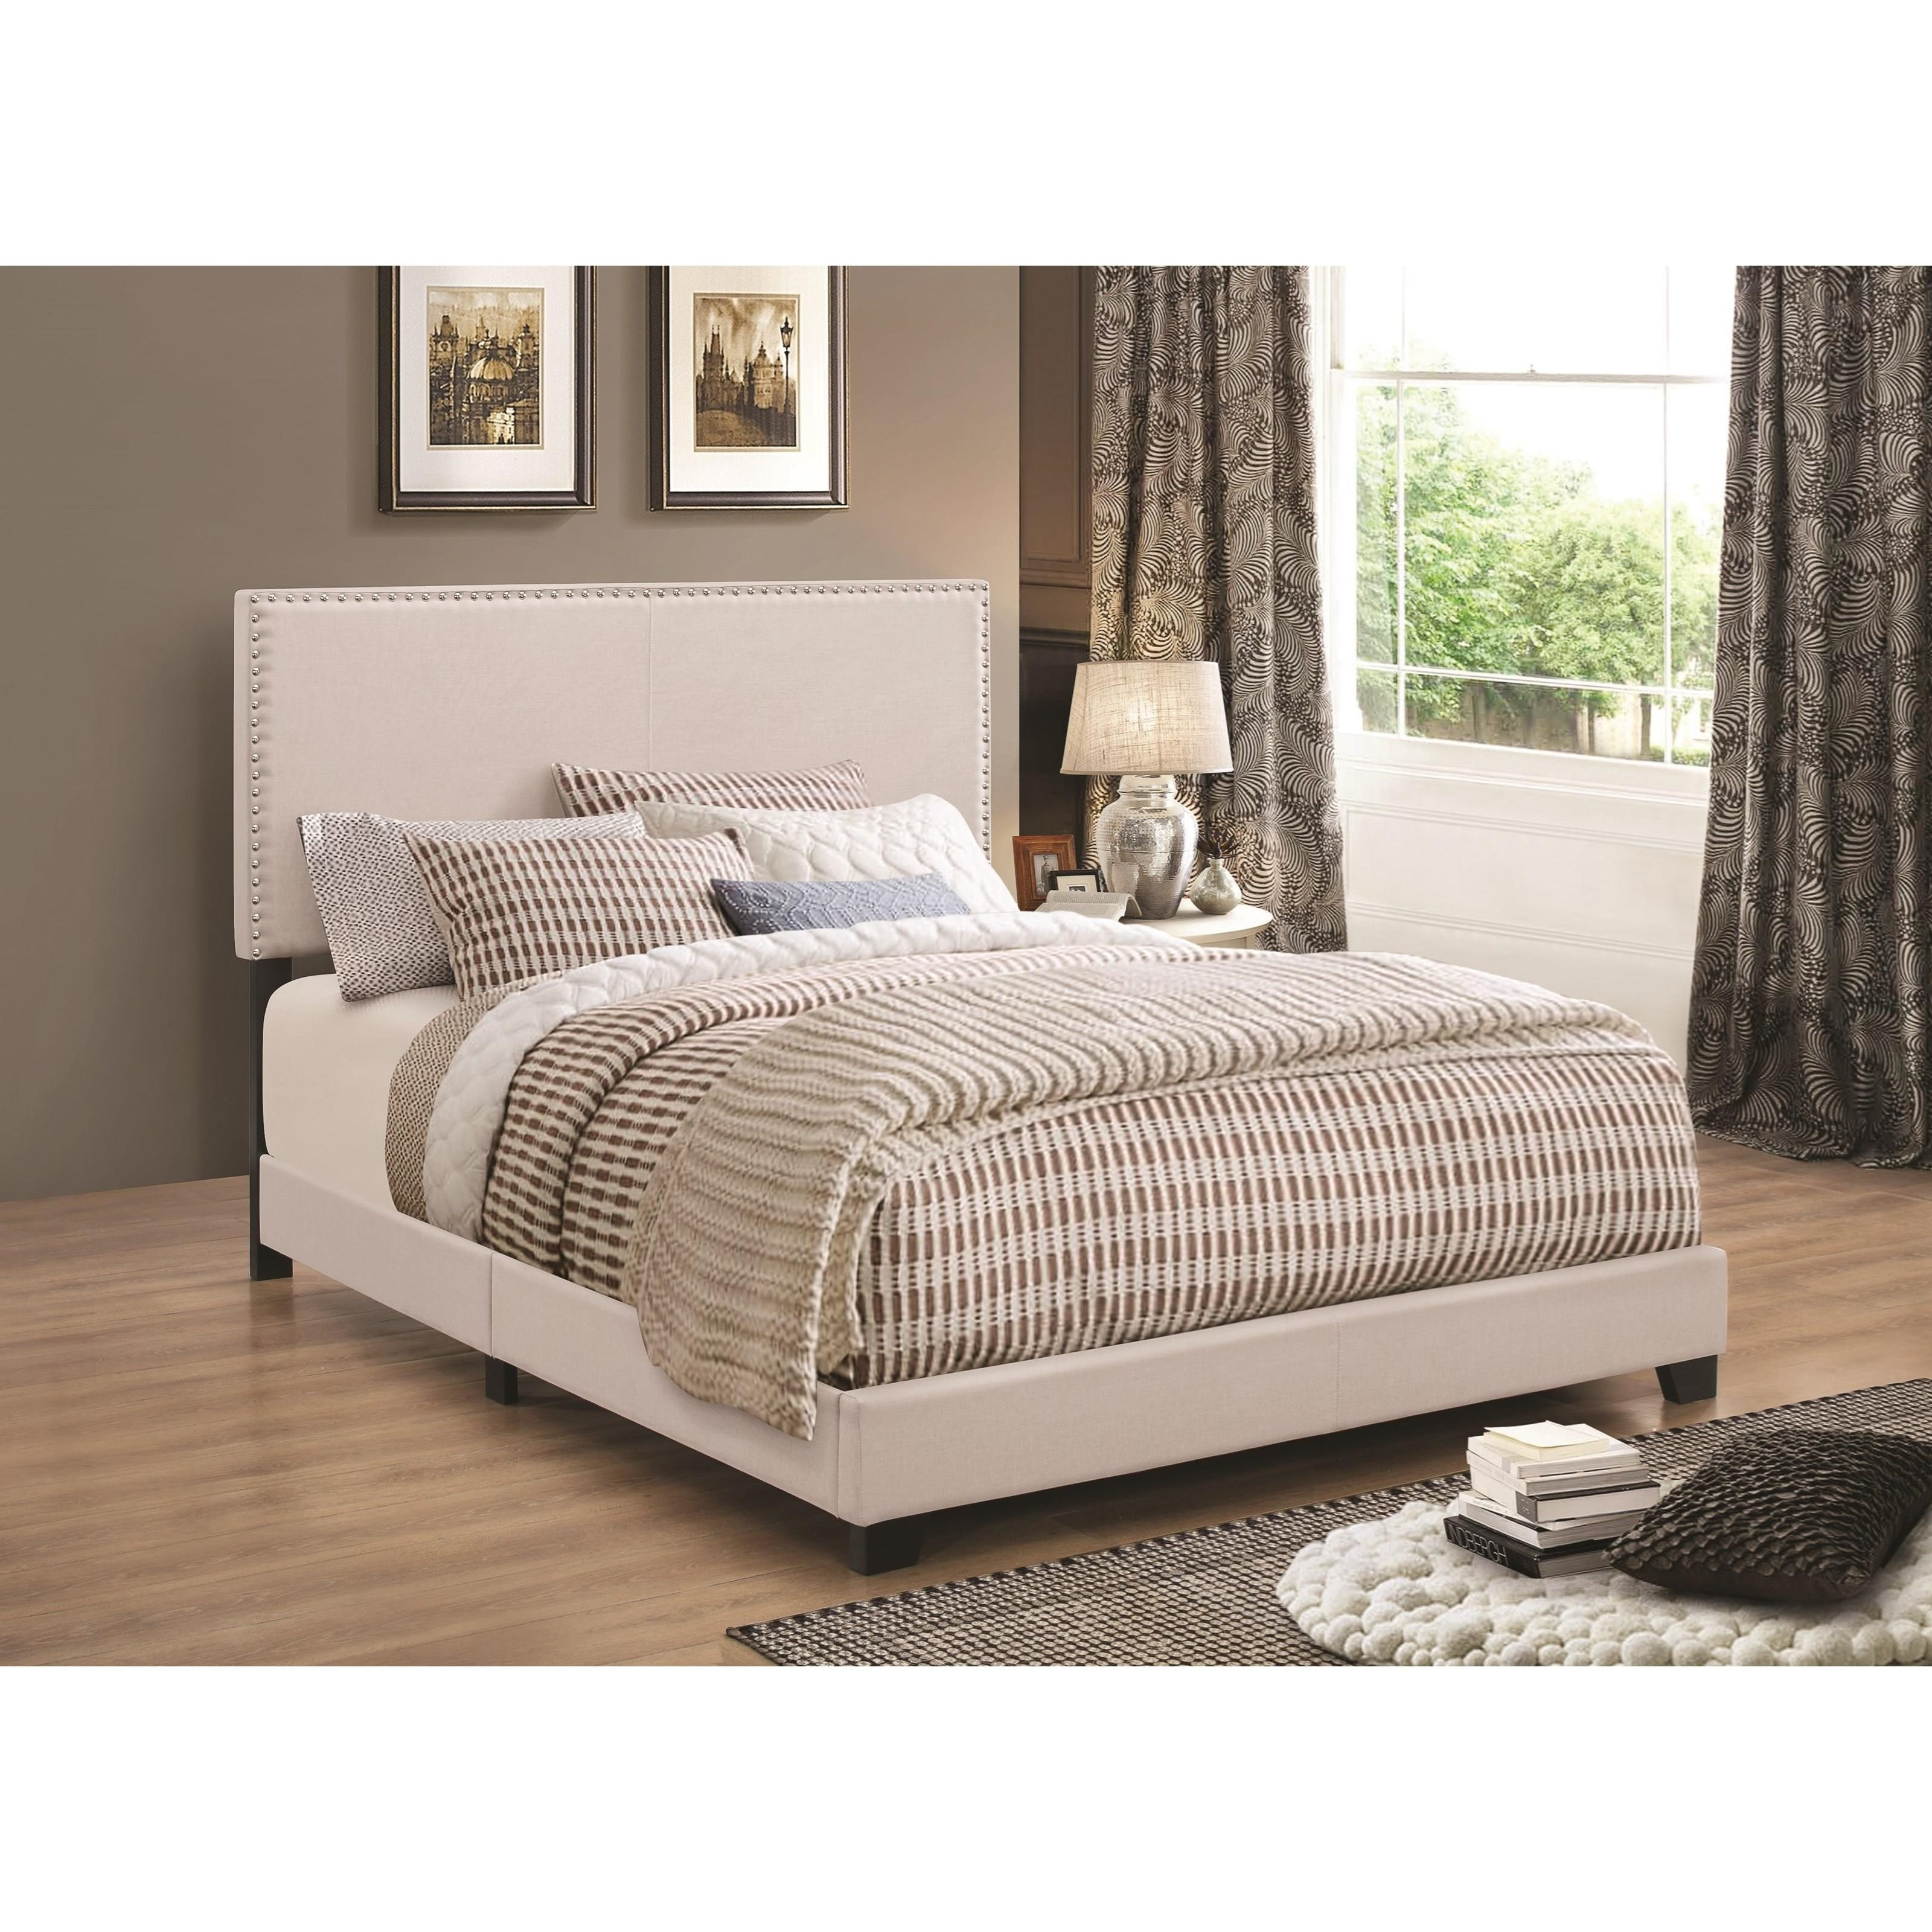 Coaster Upholstered Beds Cal King Bed - Item Number: 350051KW